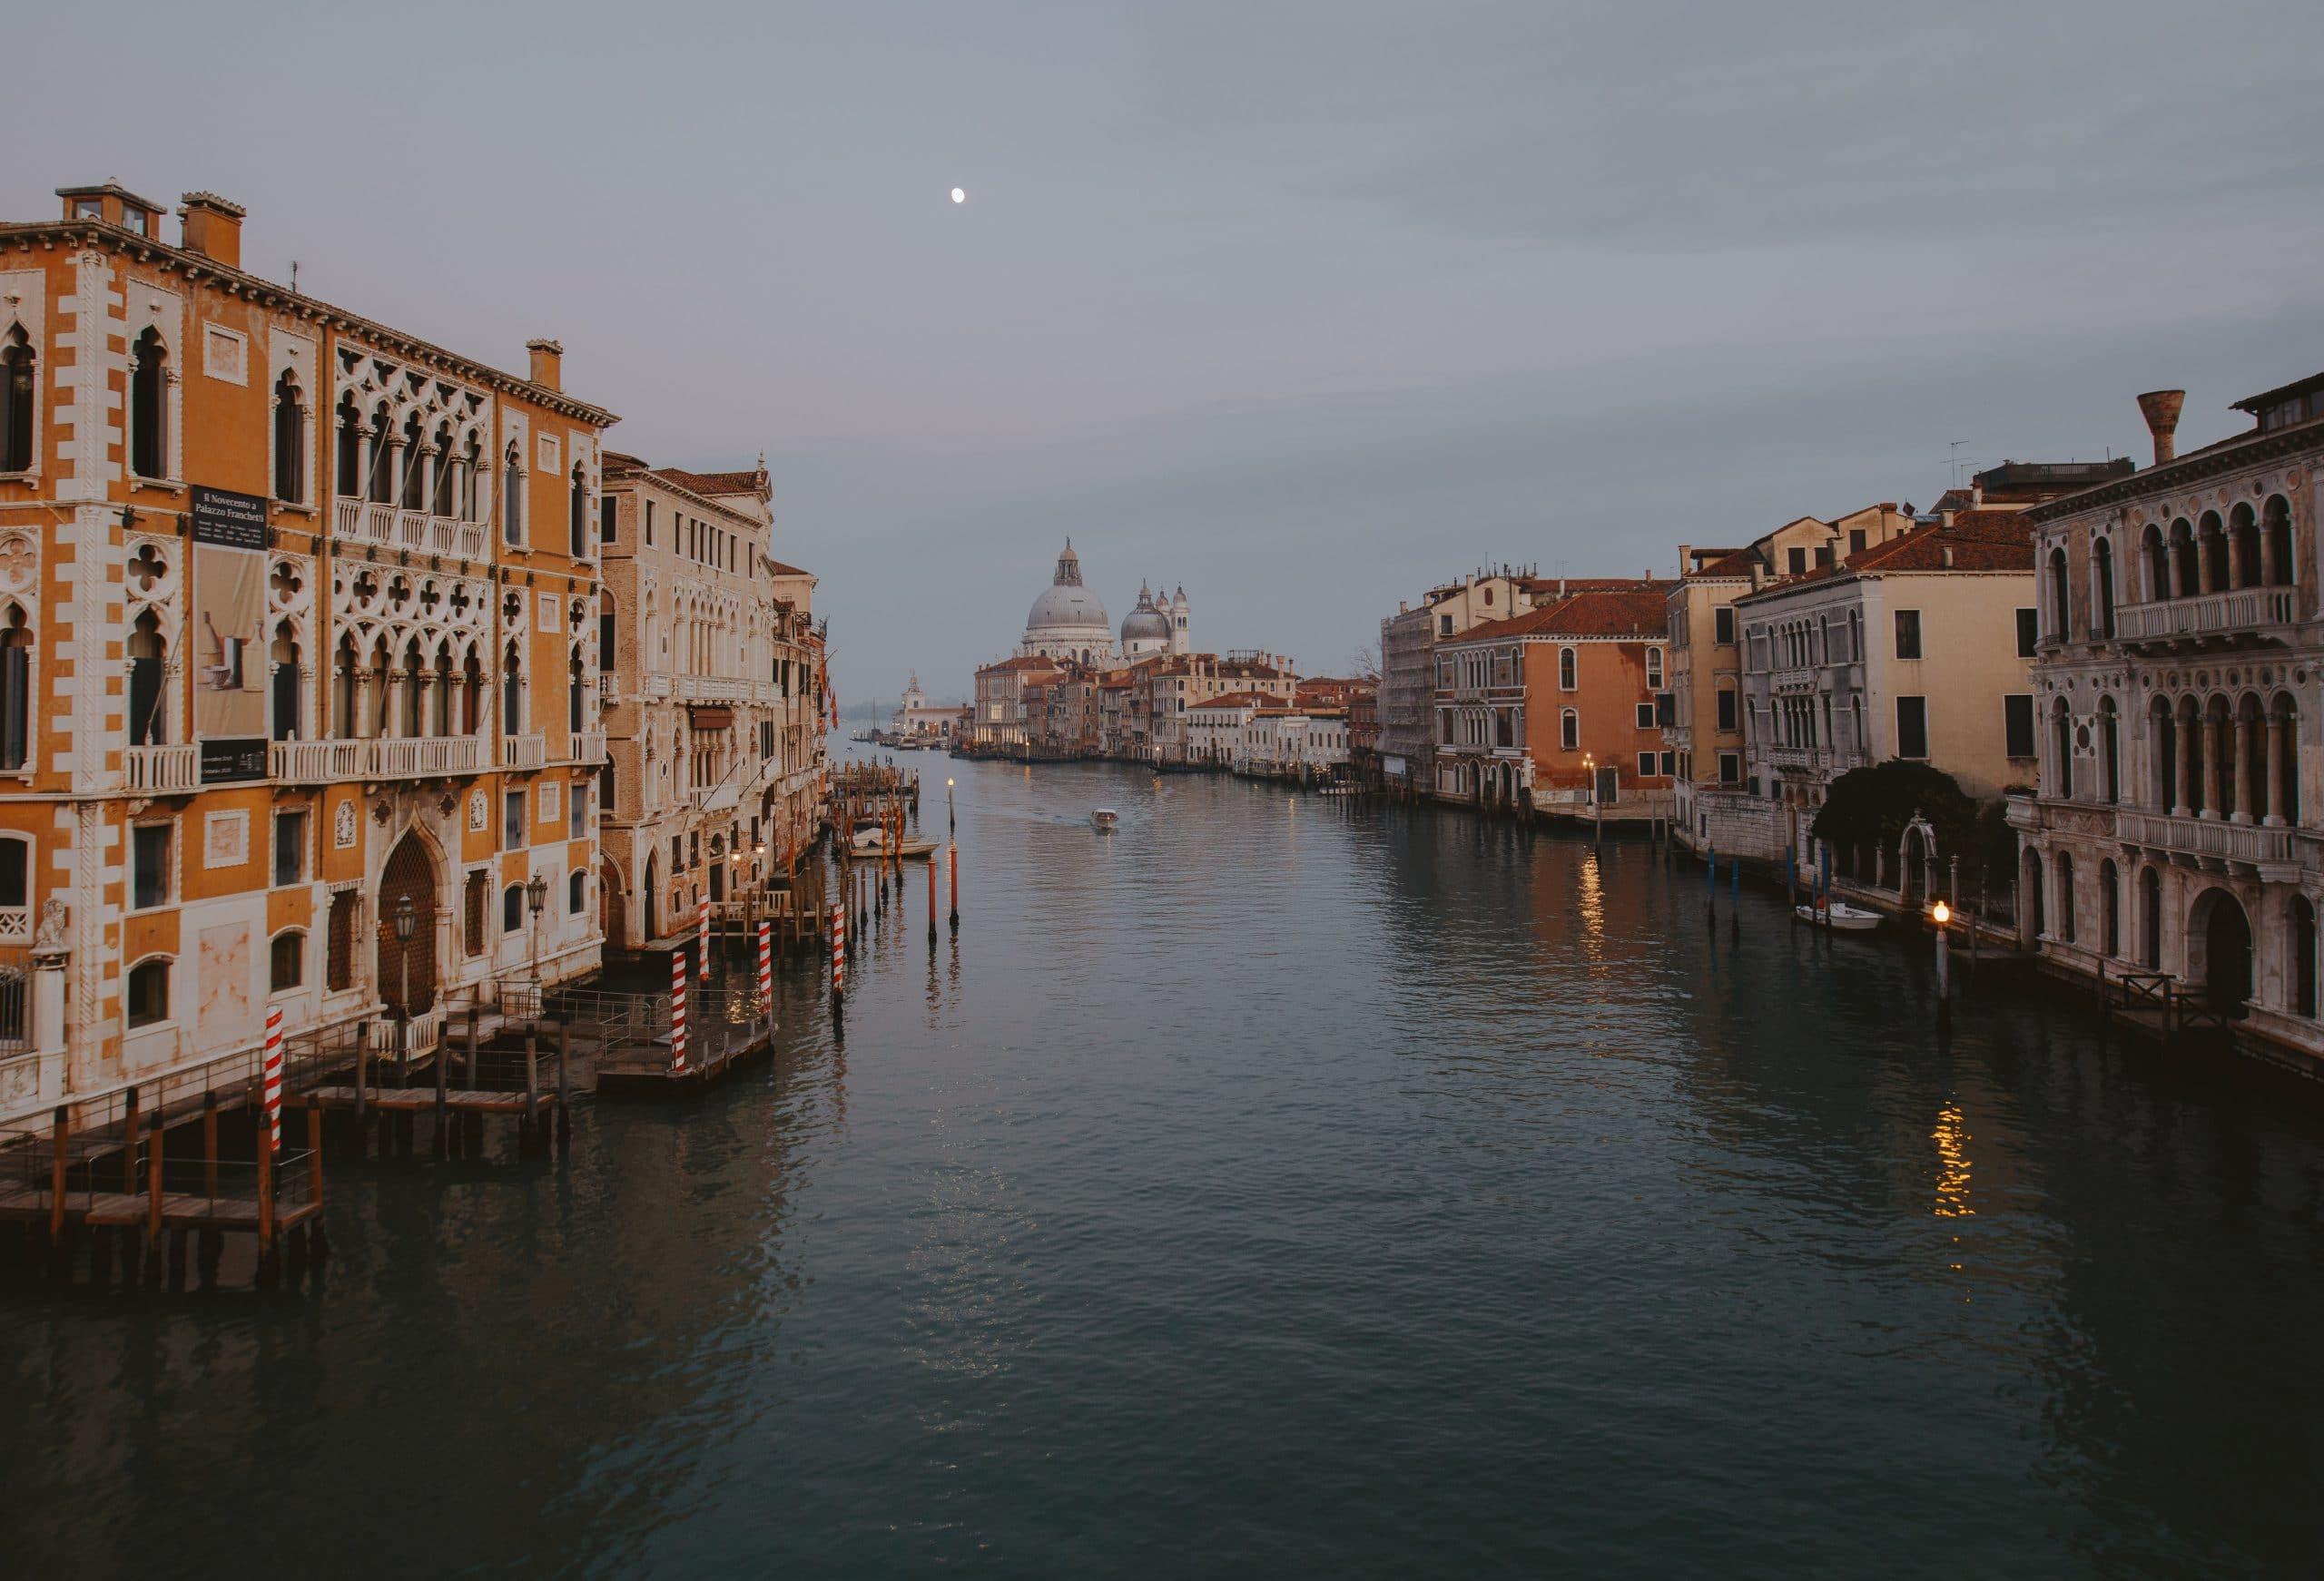 Travel Journal: Next stop, Venice